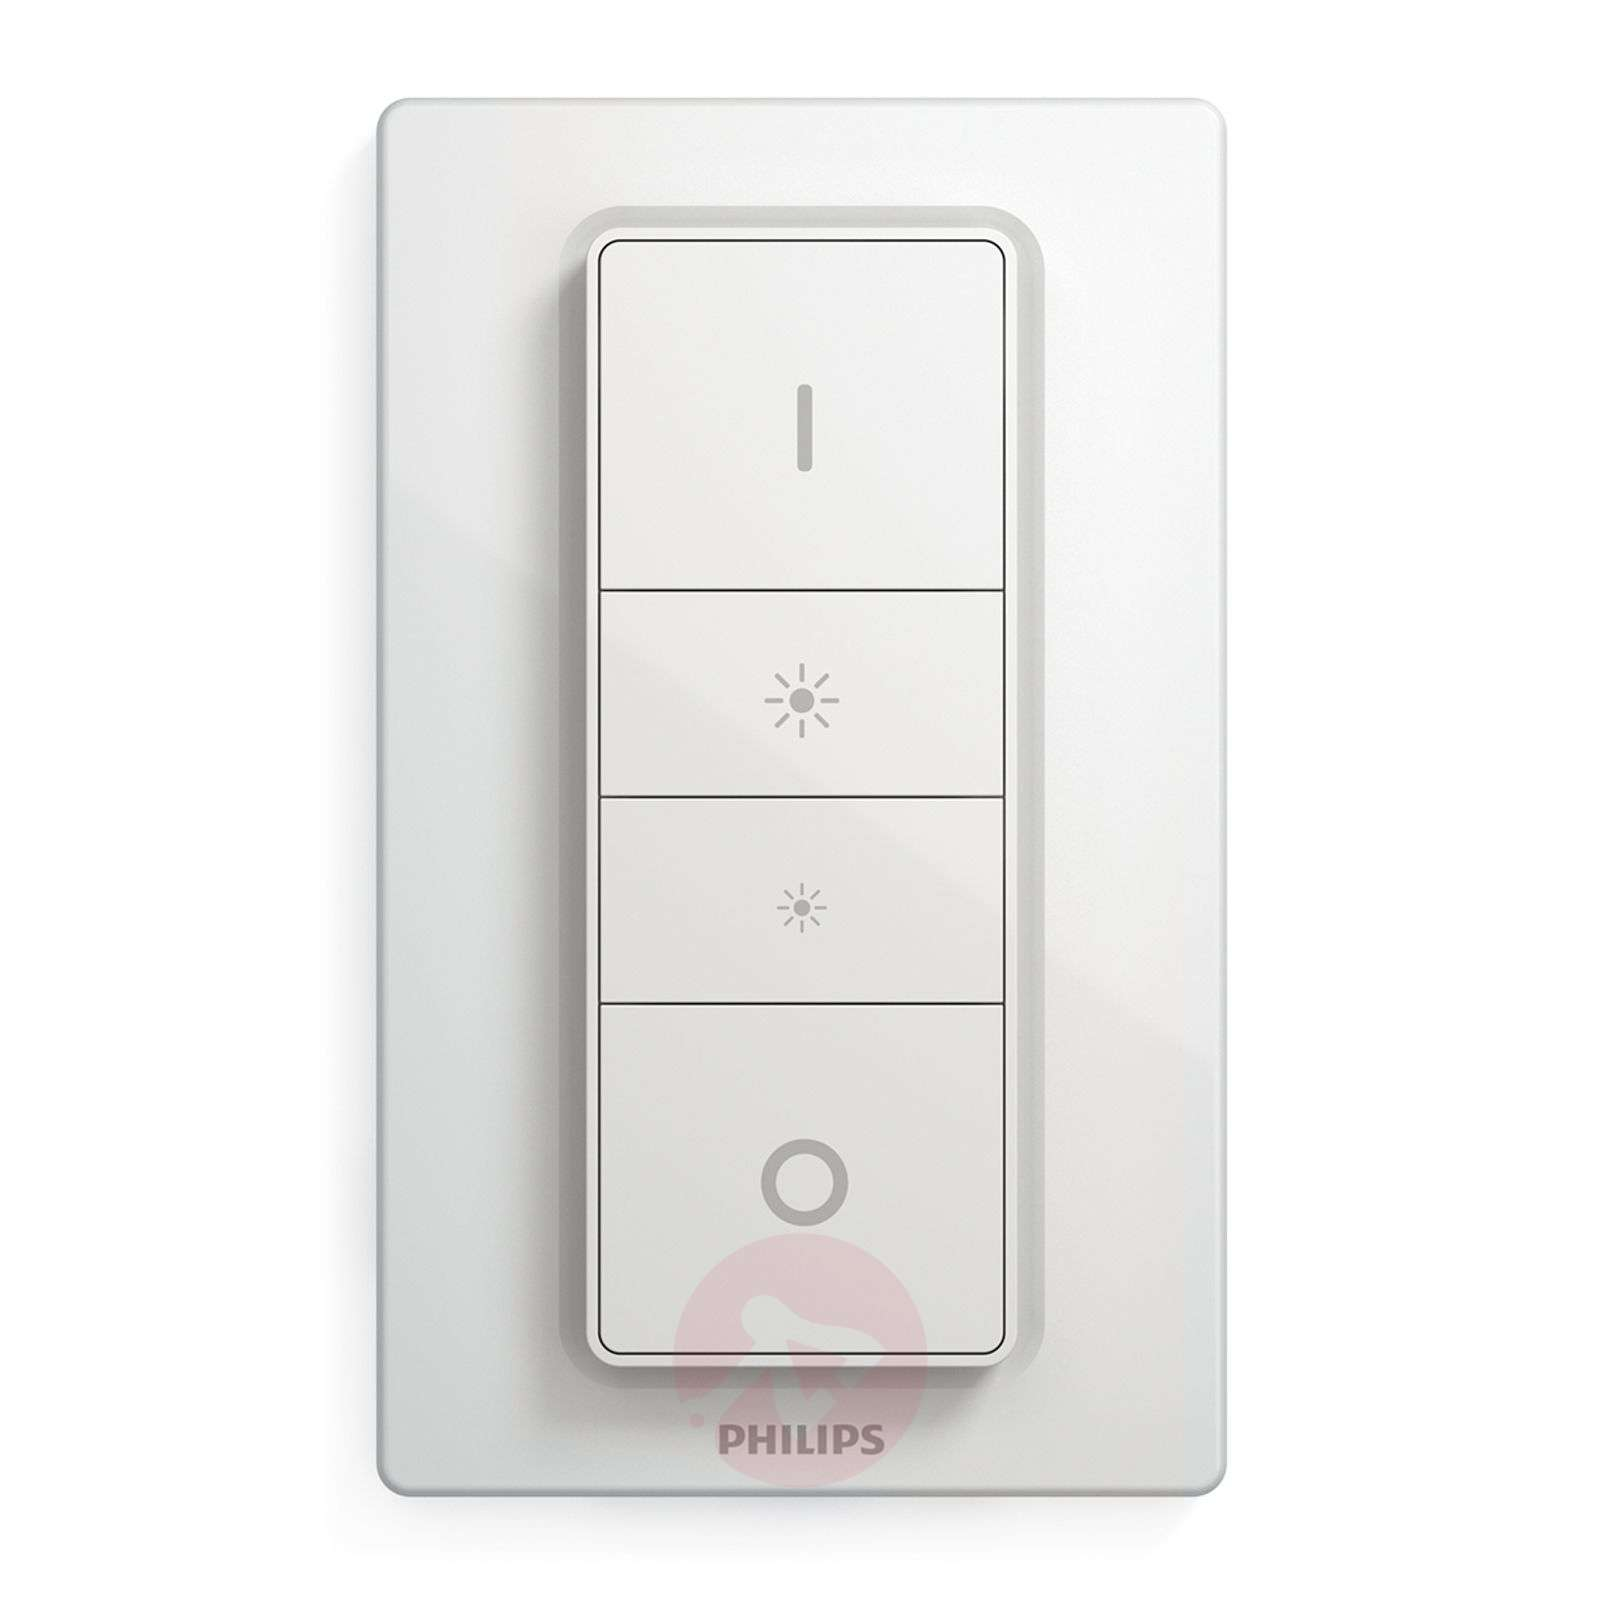 Philips Hue White Ambiance Still ceiling light alu-7531867-01